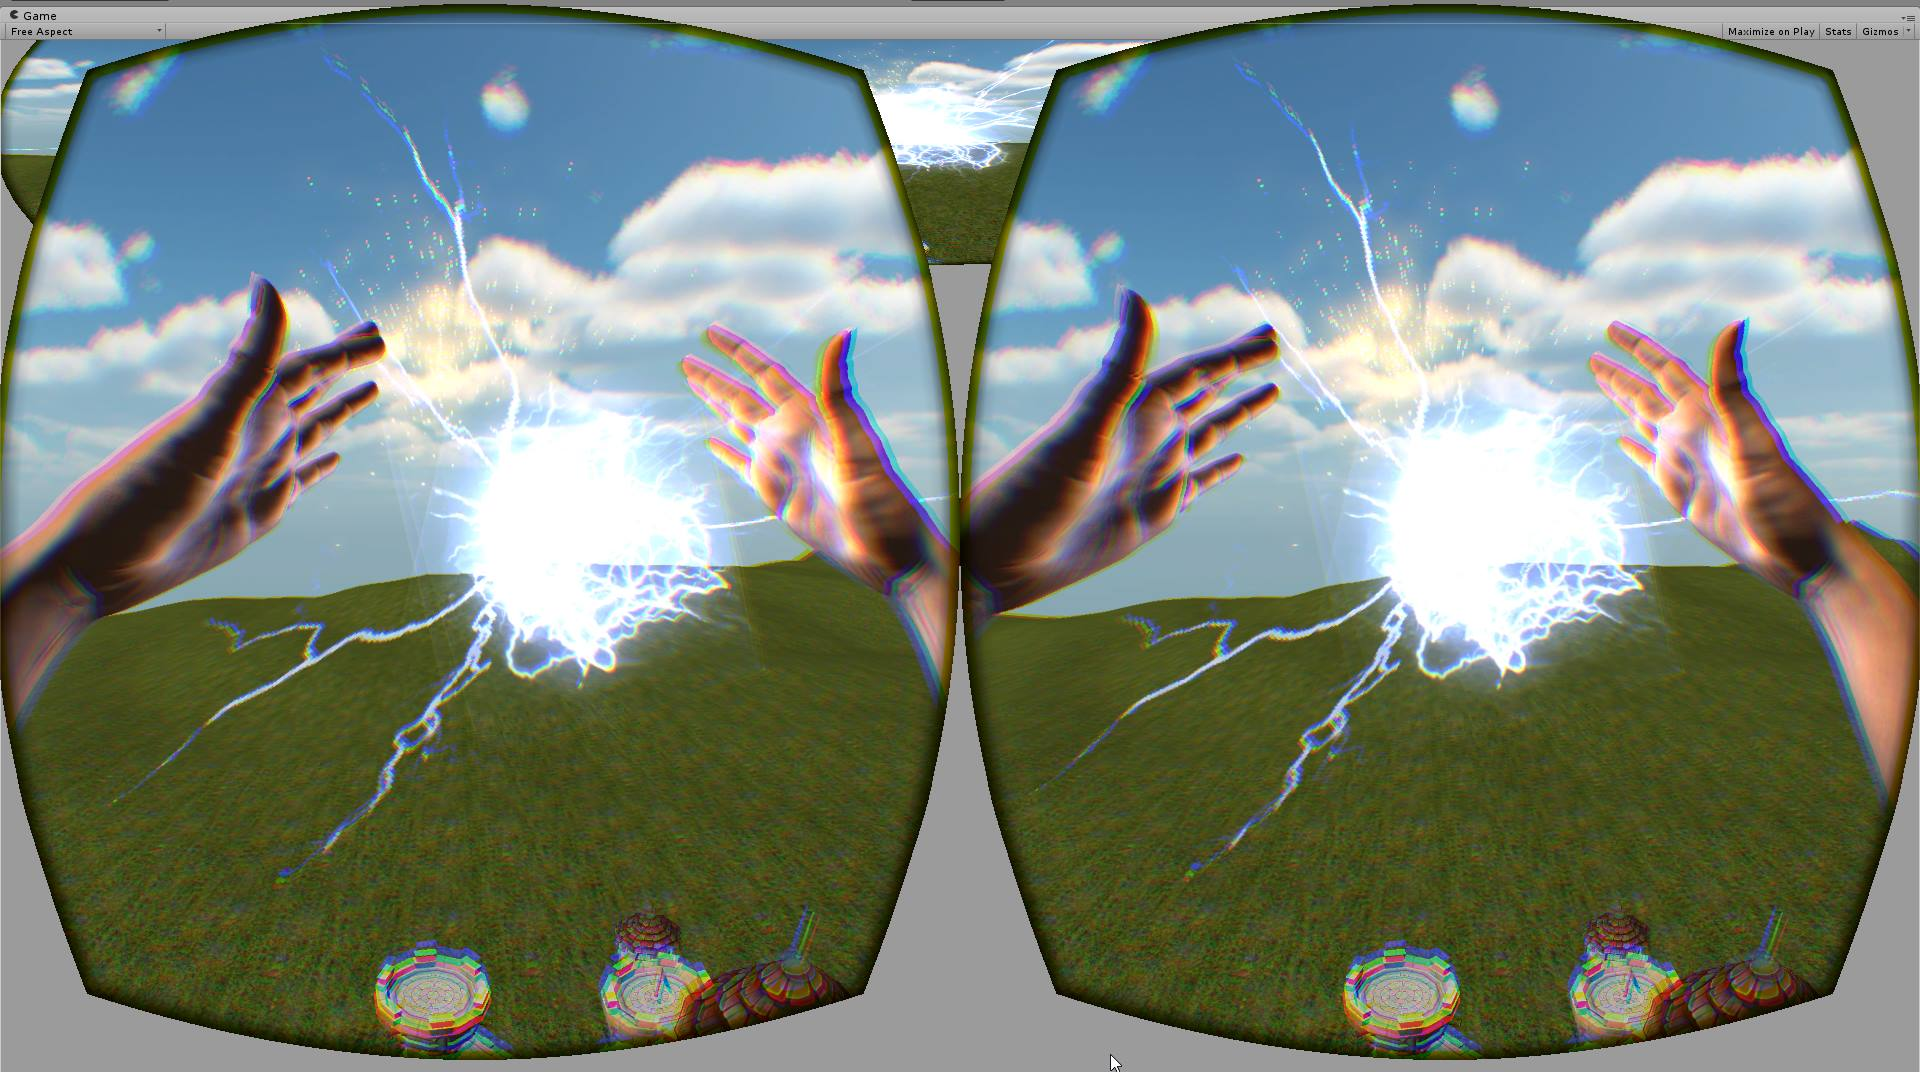 VR Wizard simulator prototype